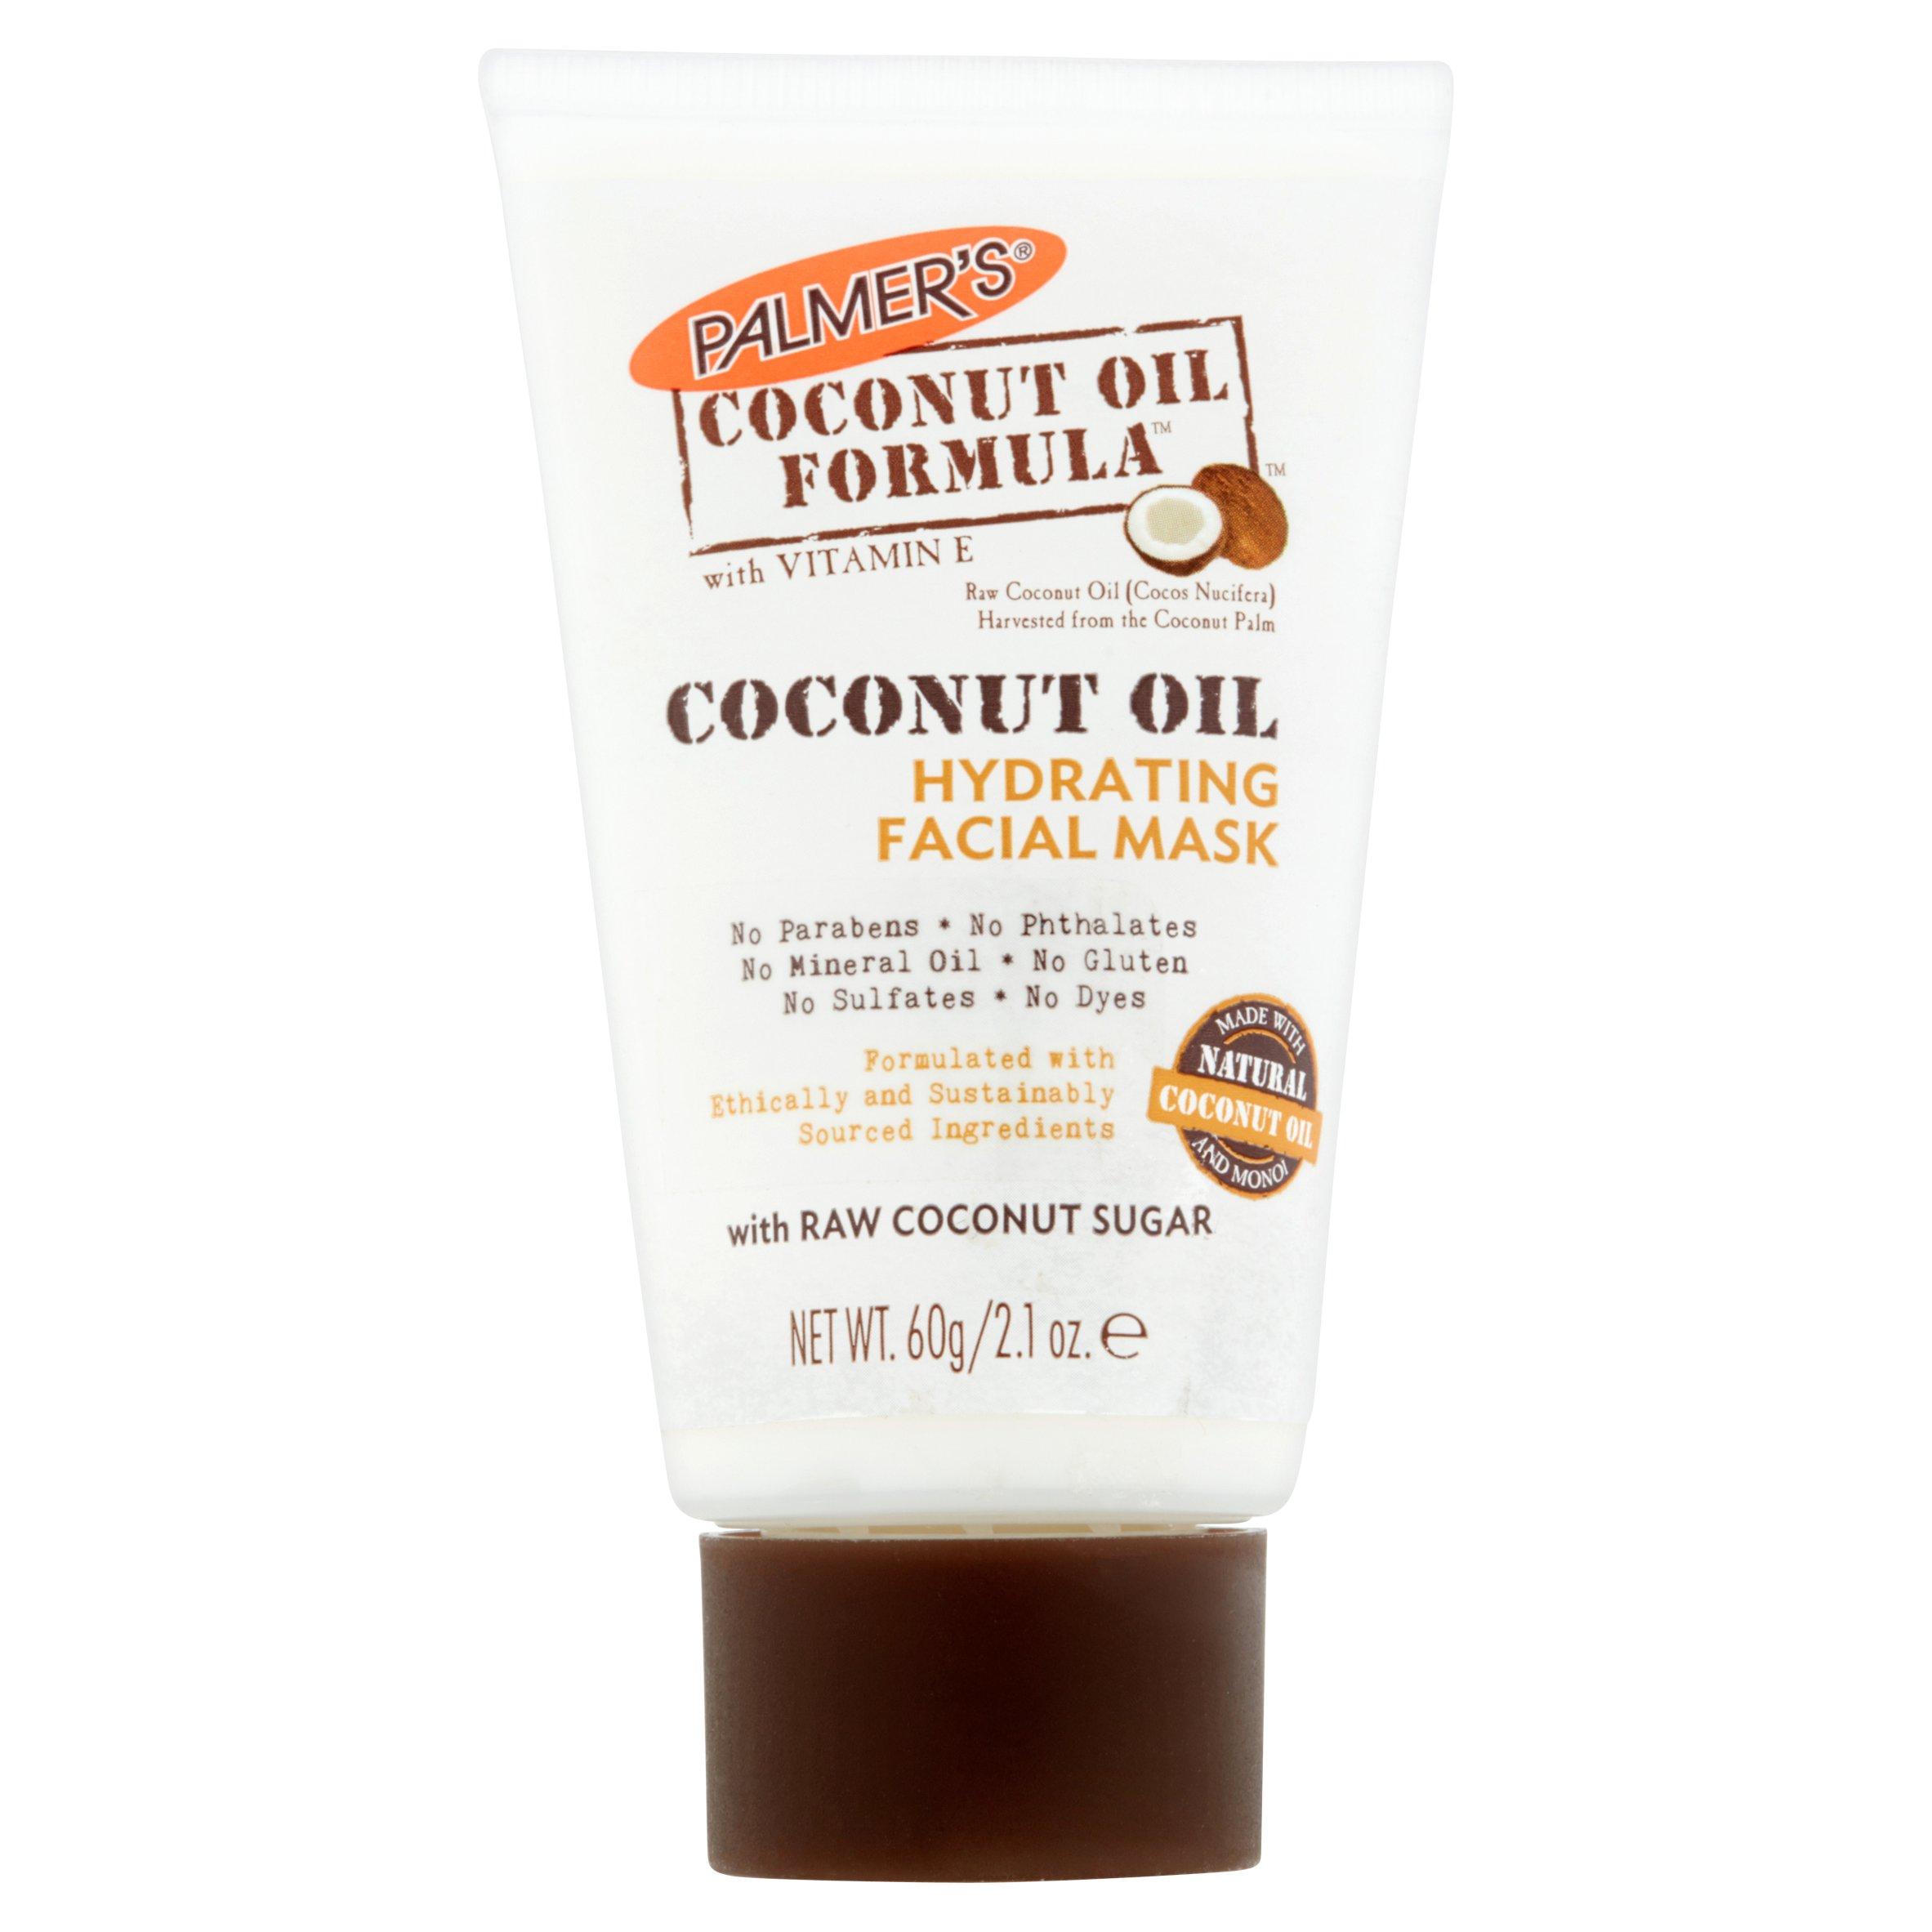 Palmer's Coconut Oil Formula Coconut Oil Hydrating Facial Mask, 2.1 oz